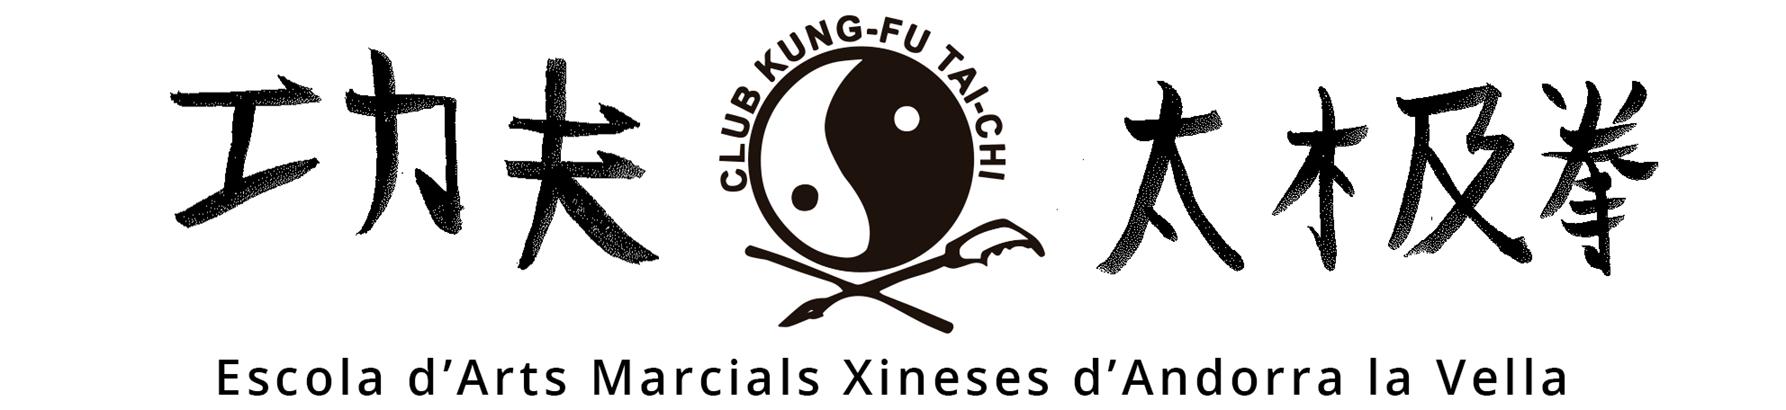 Club Kung-Fu Taichi Andorra la Vella